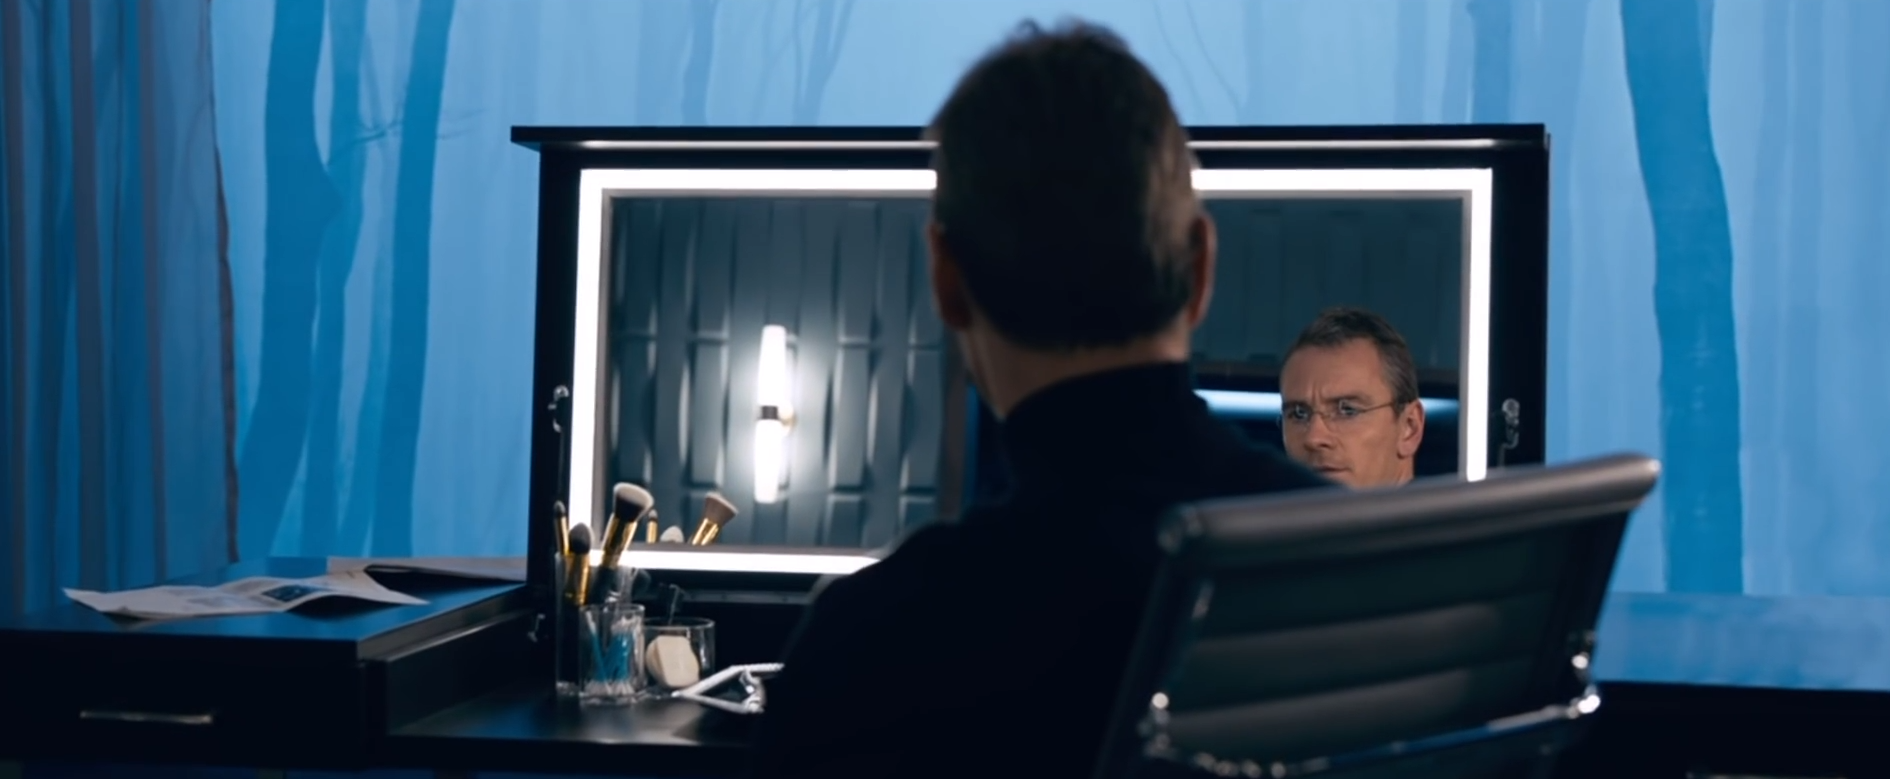 "Michael Fassbender spielt in ""Steve Jobs"" den Apple-Gründer."